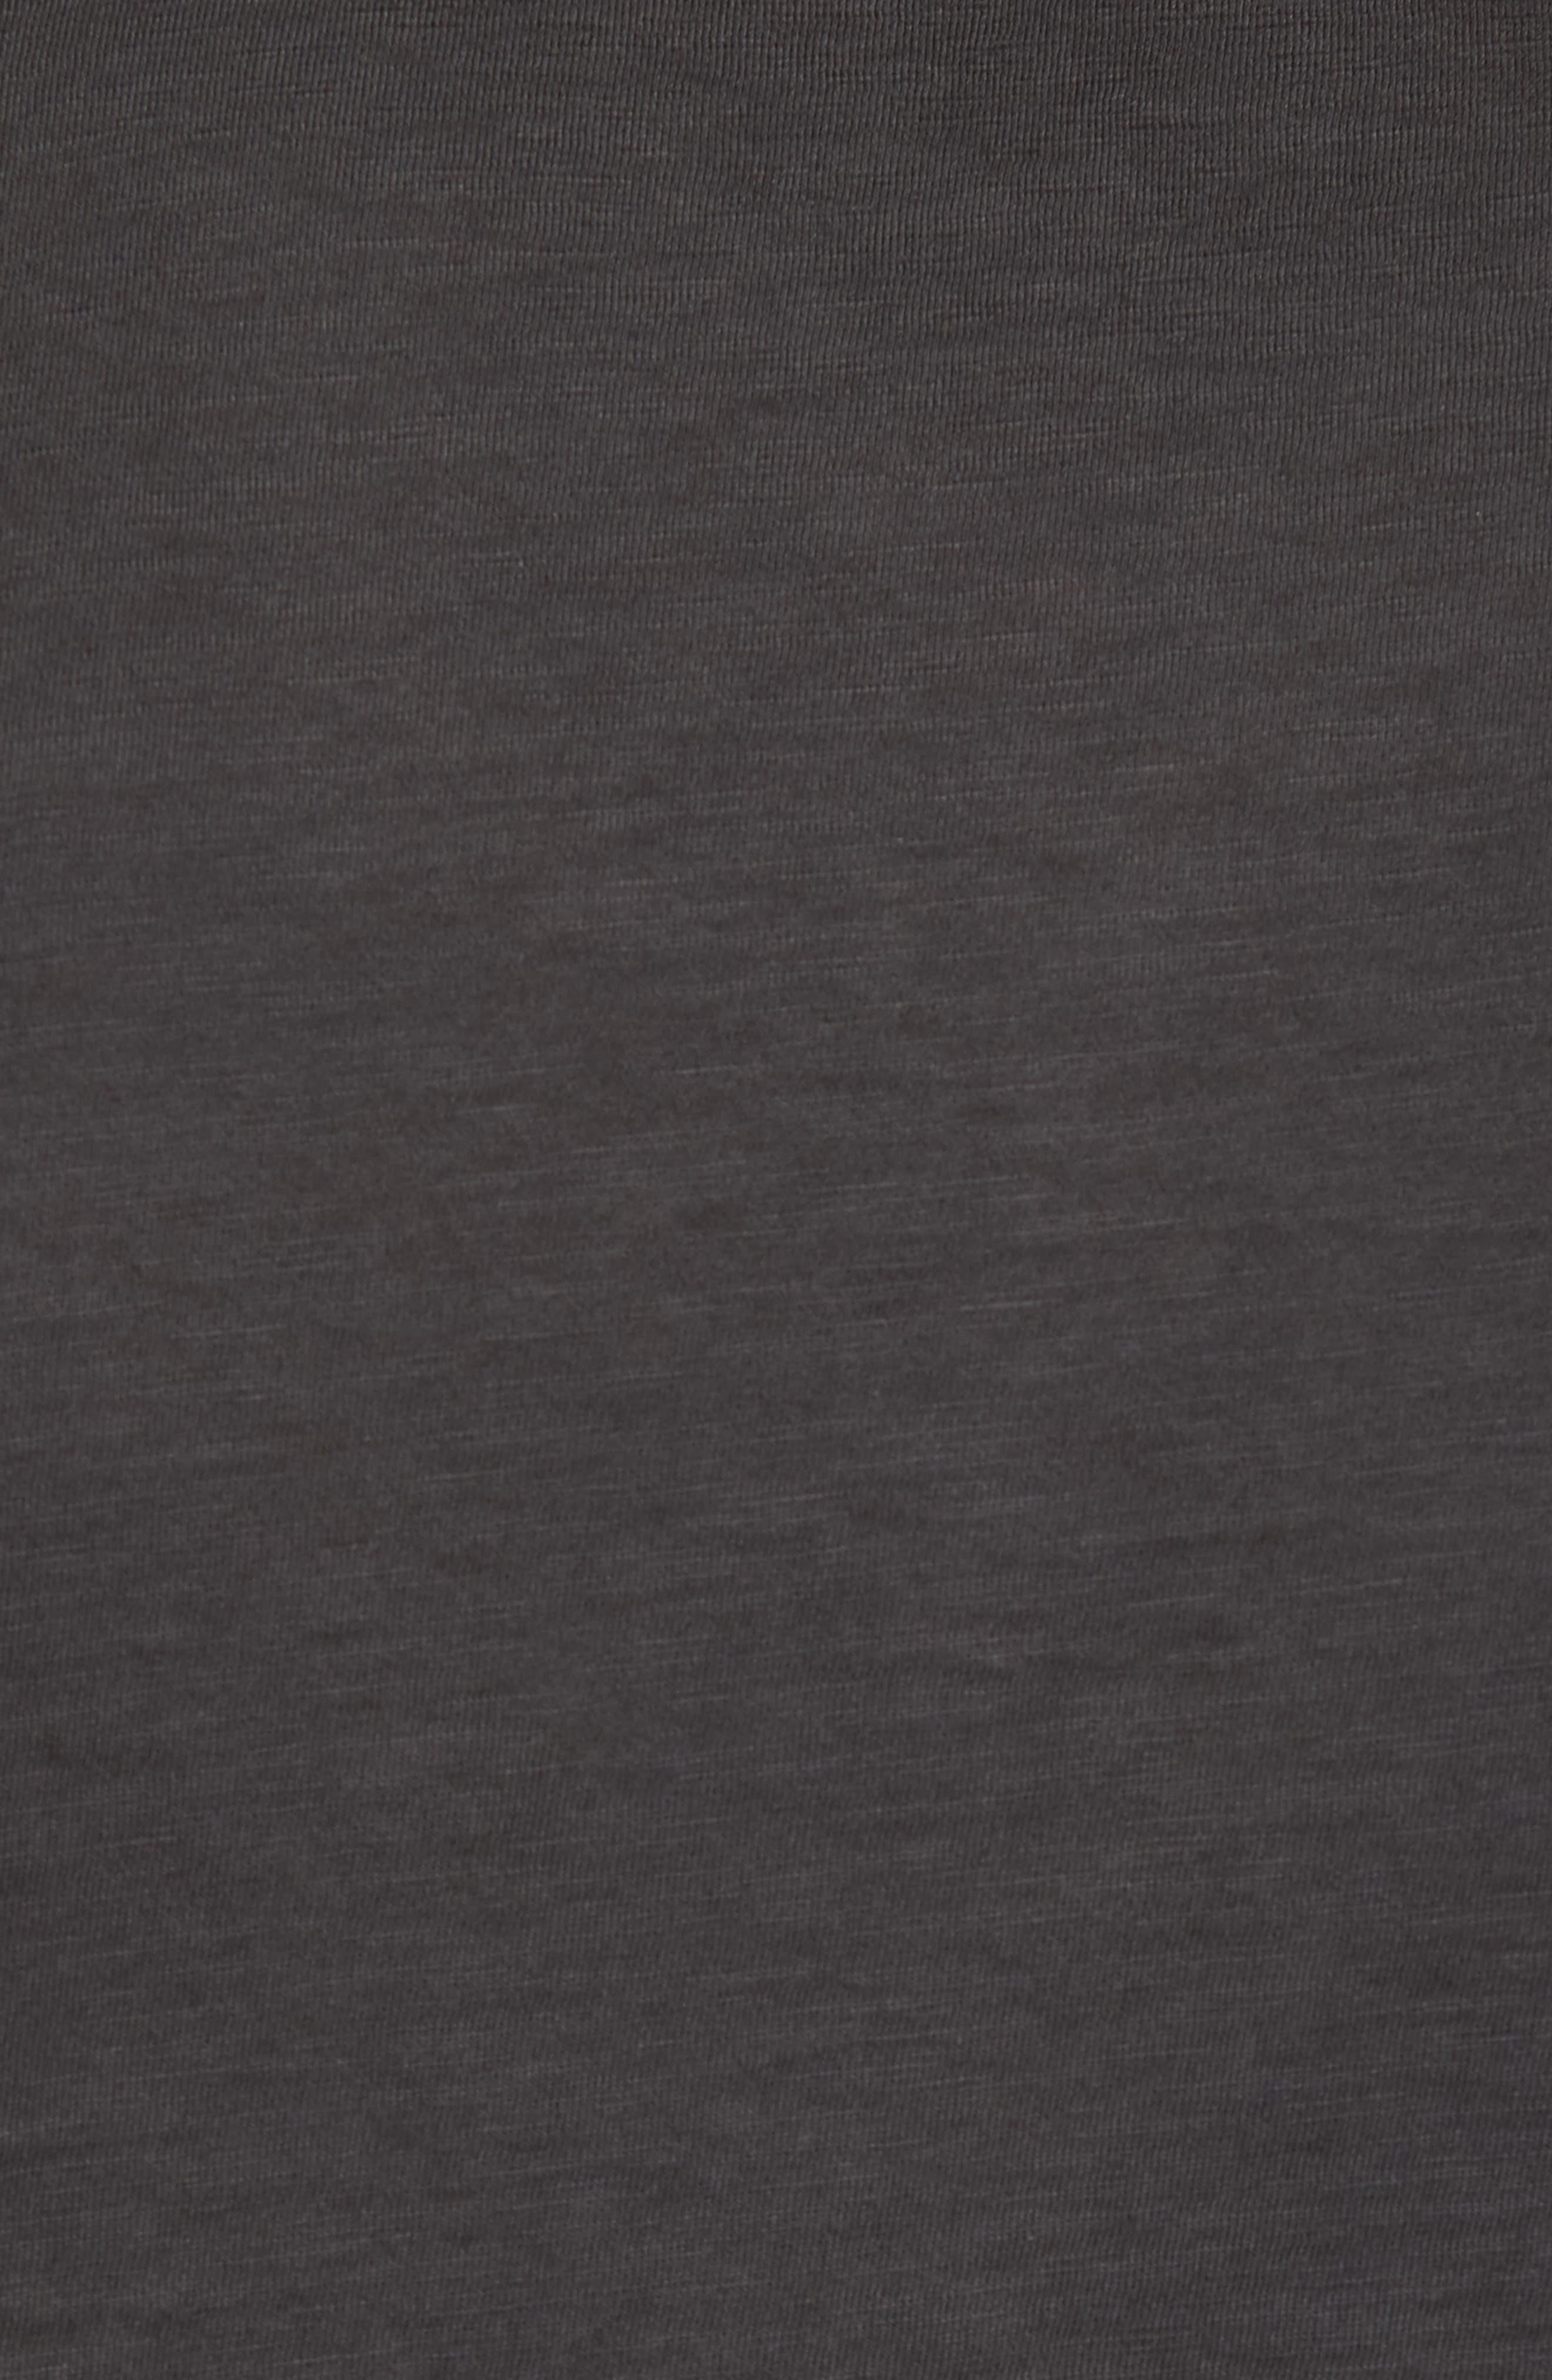 Sunwash Henley T-Shirt,                             Alternate thumbnail 5, color,                             Black